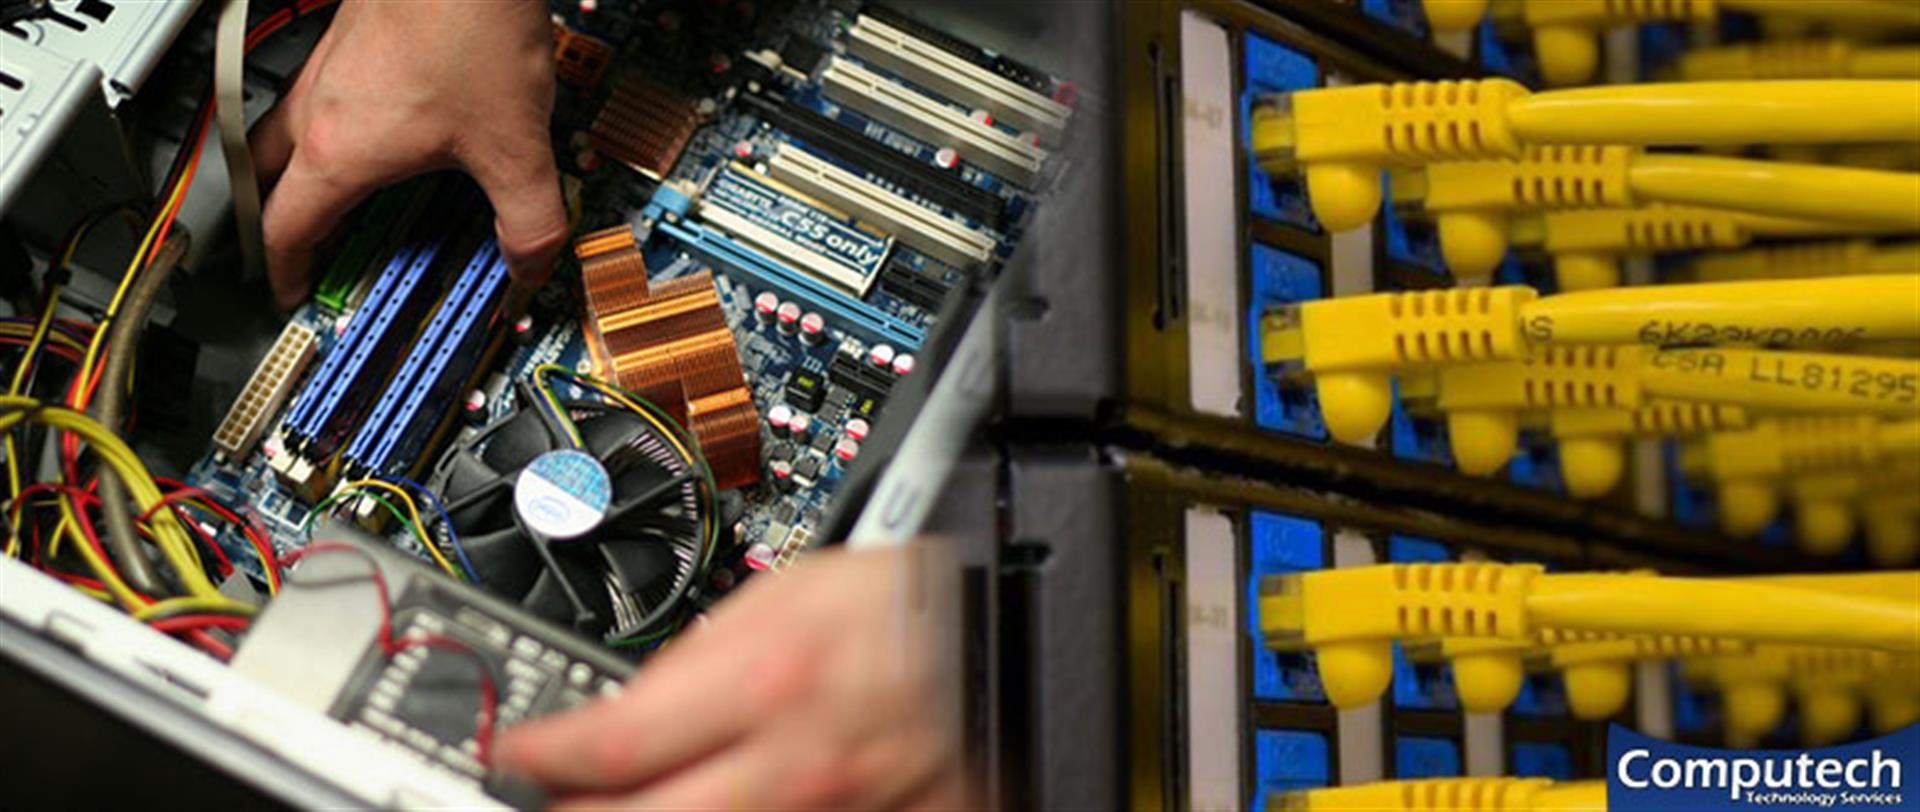 Staunton Virginia On Site PC & Printer Repairs, Networks, Voice & Data Cabling Services